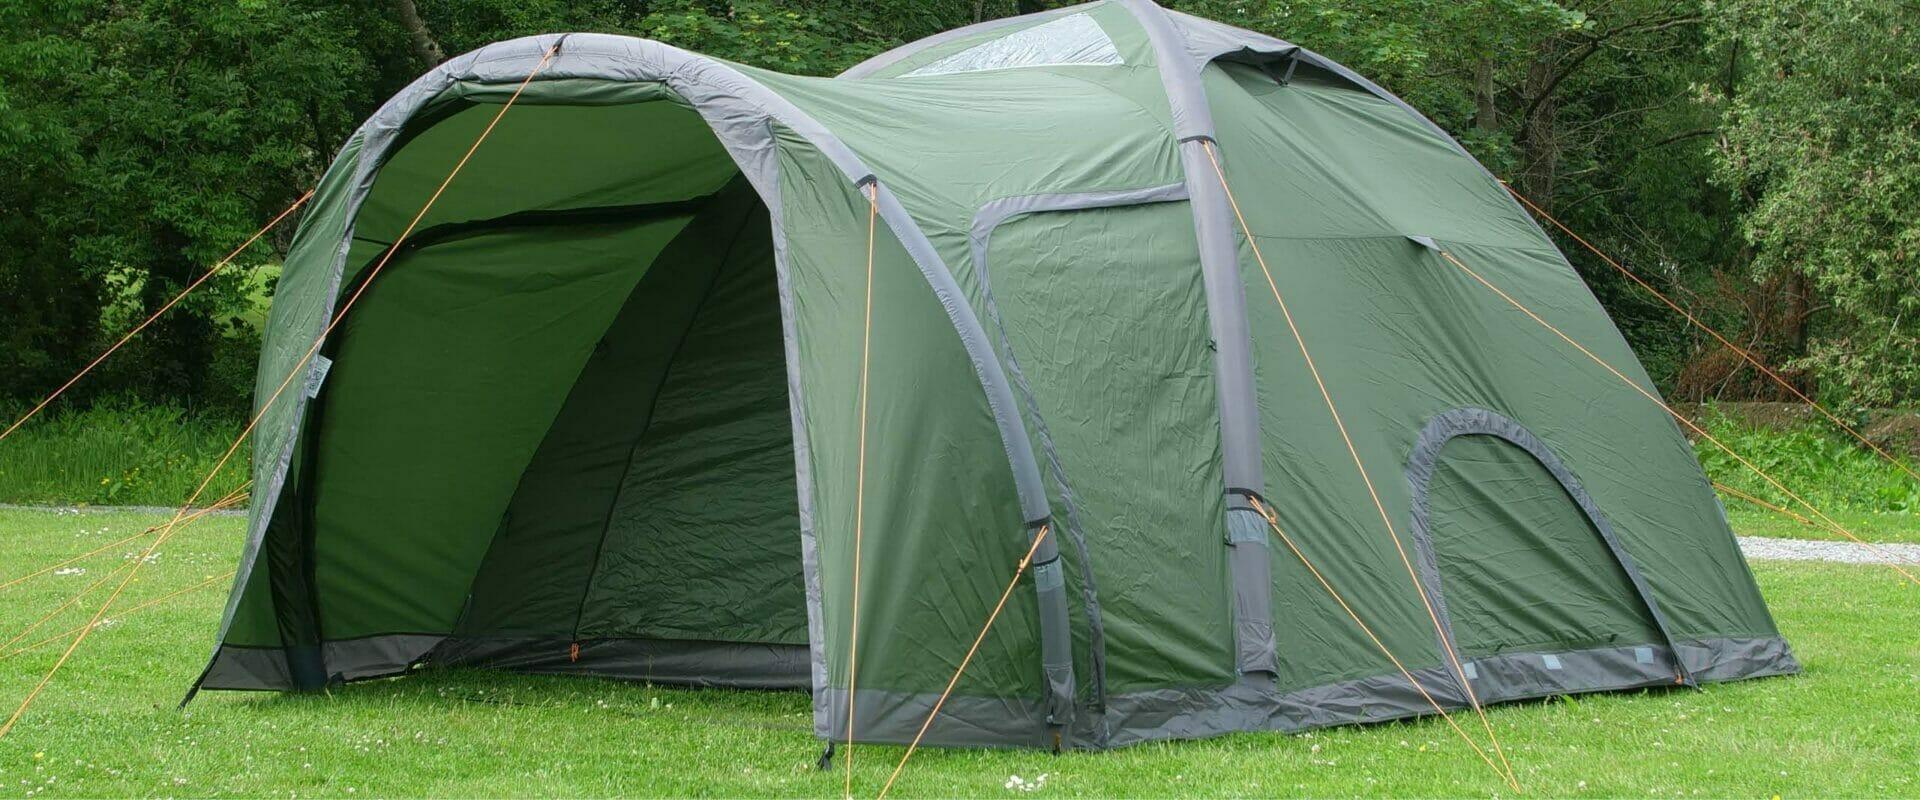 best 6 person tent under 100